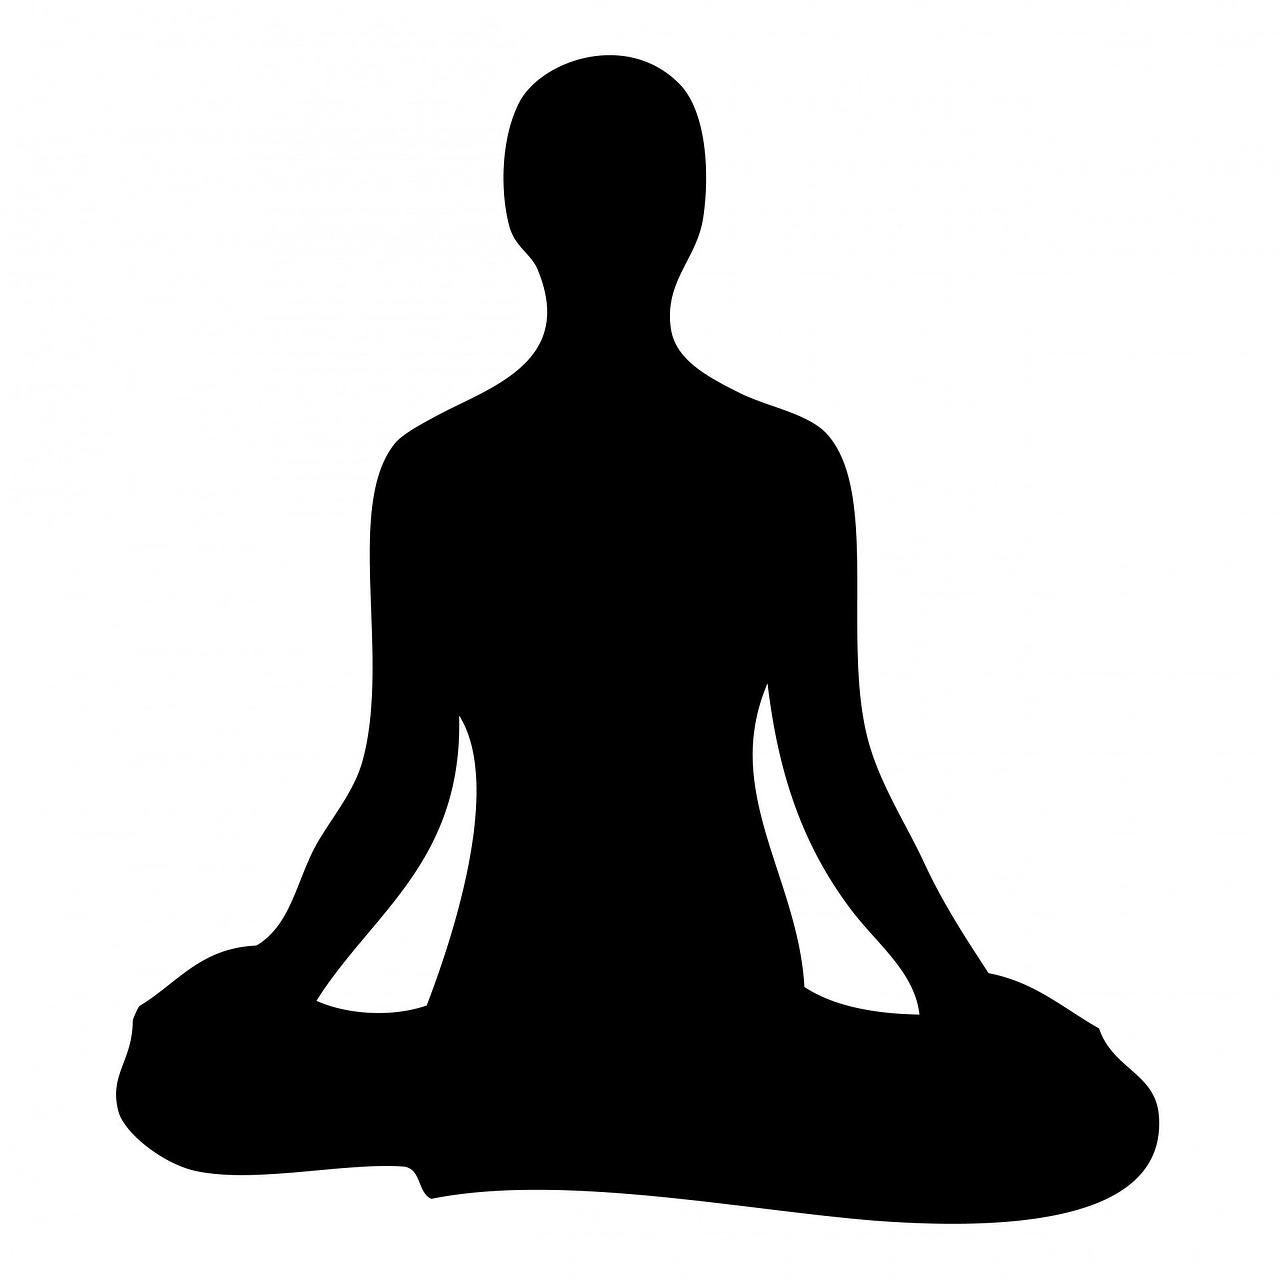 Free Meditation Cliparts, Download Free Clip Art, Free Clip.